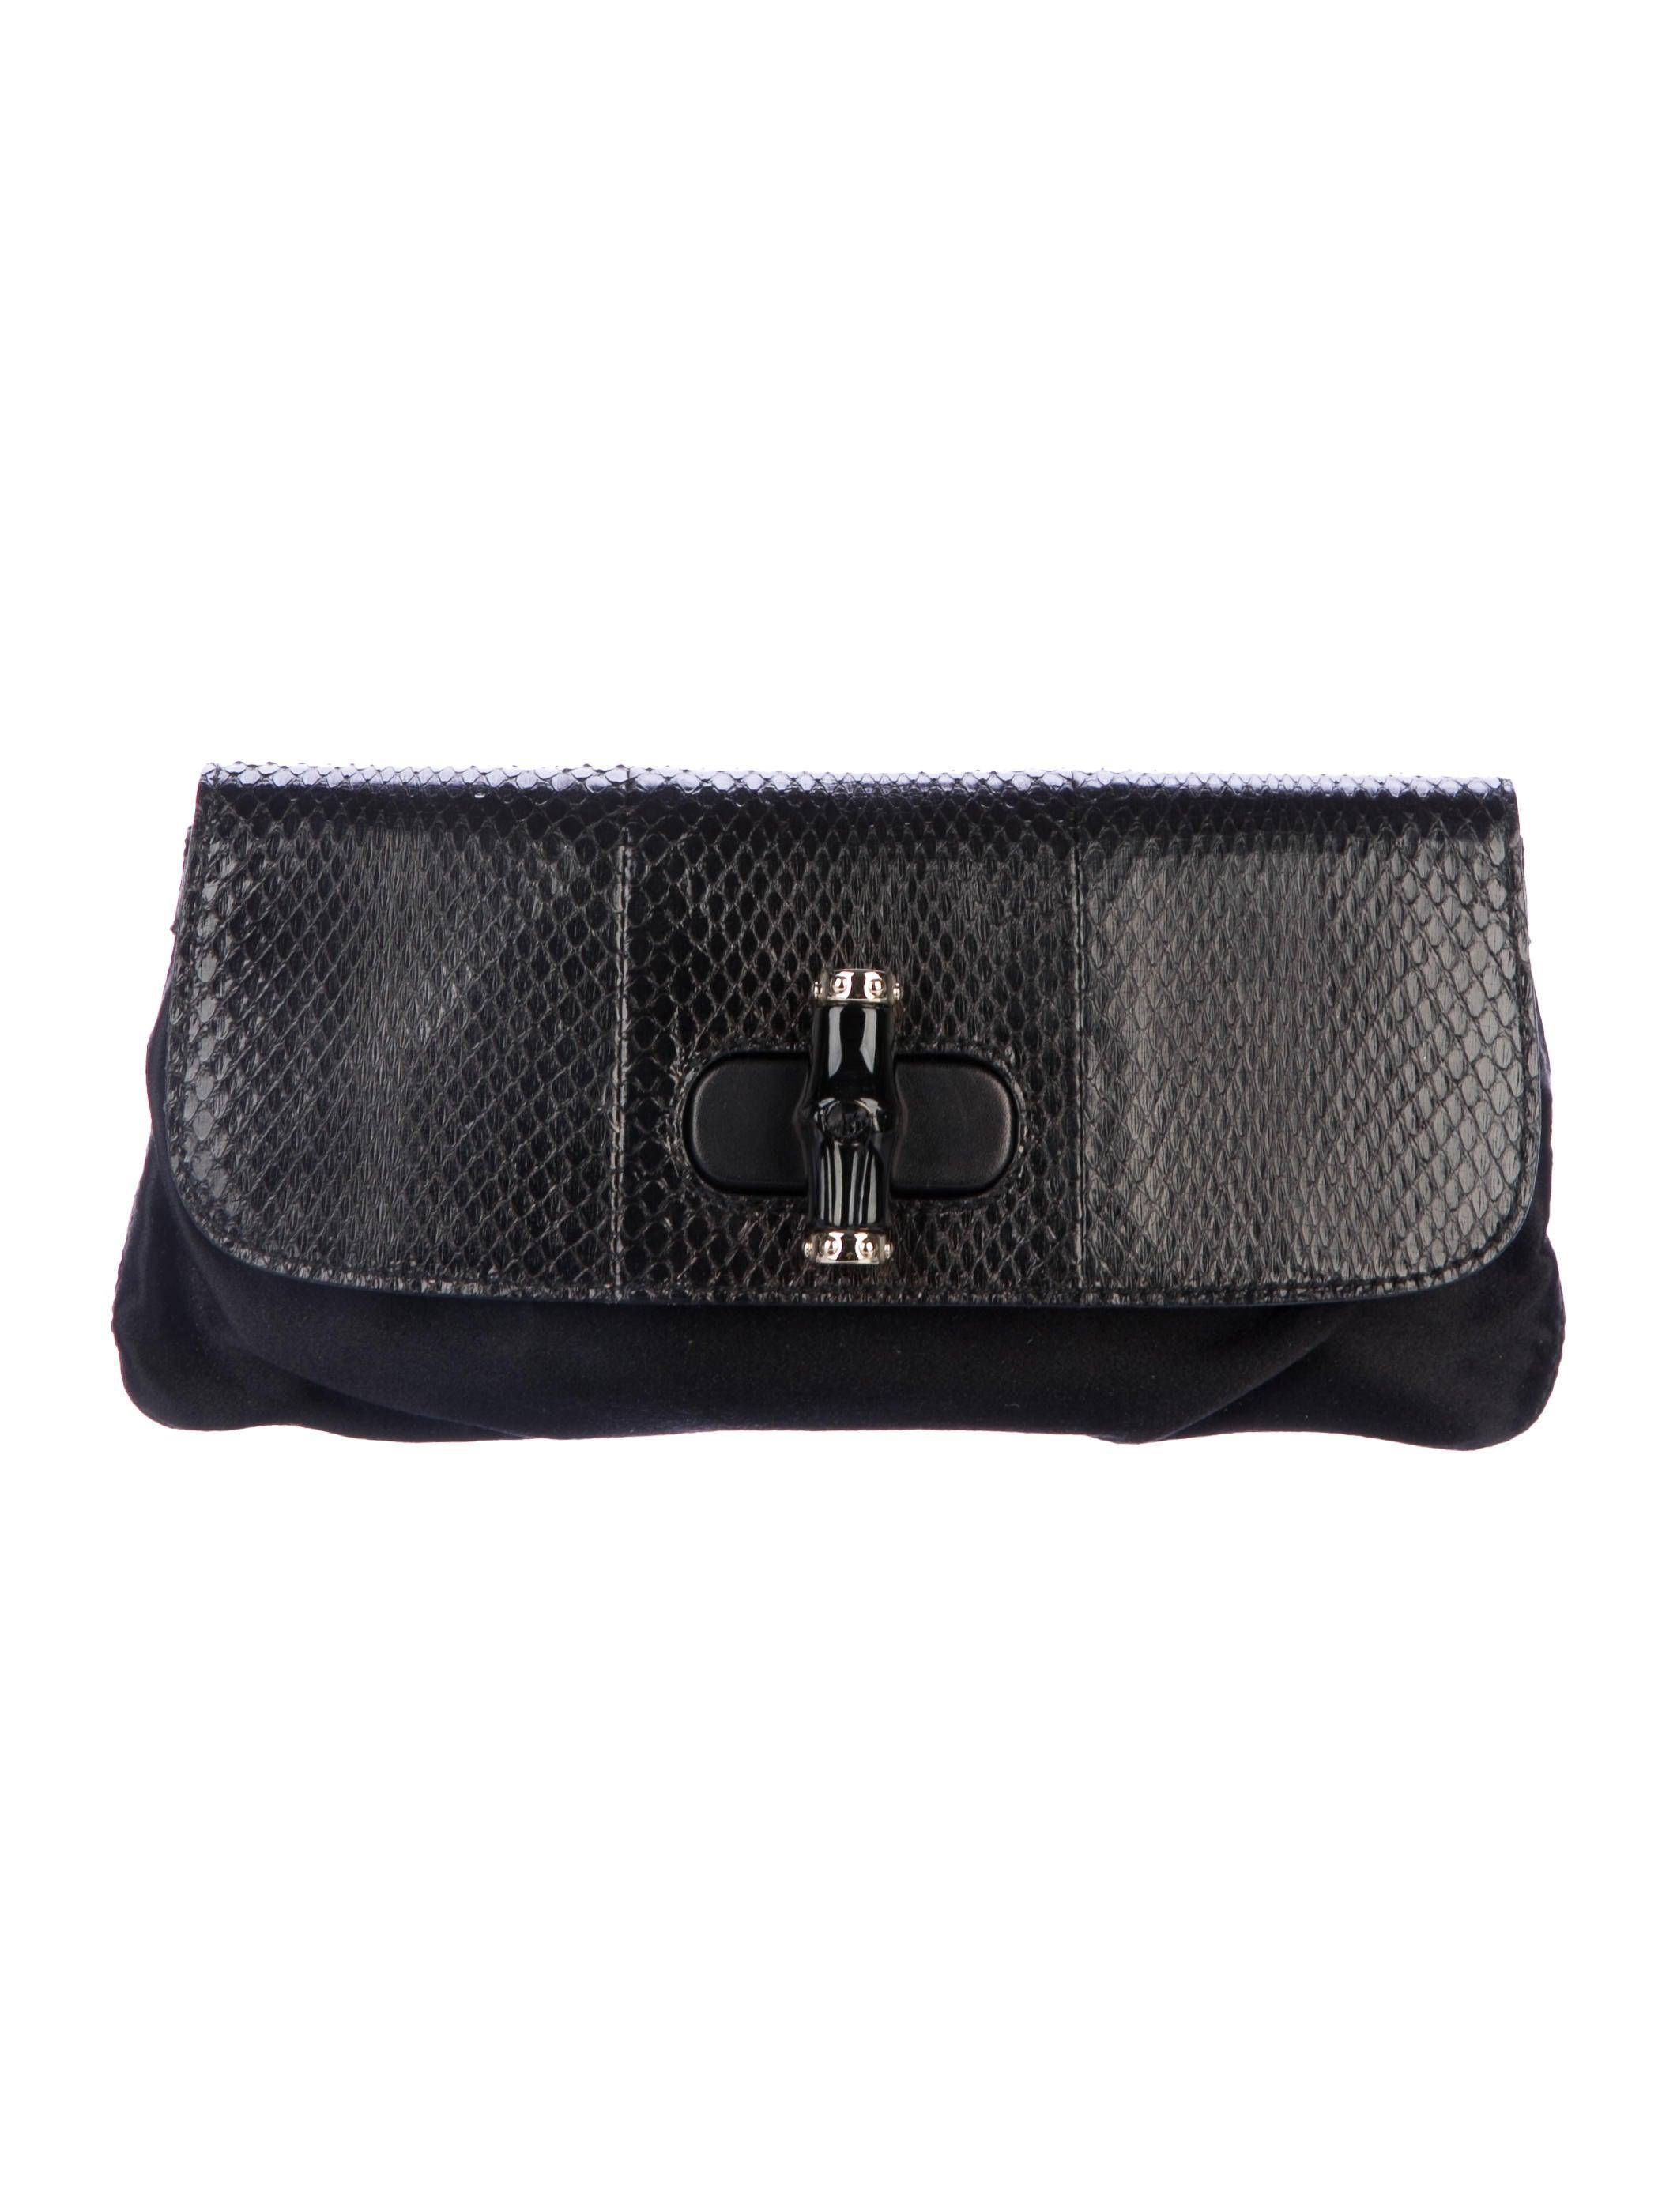 d38874f67e8e47 Gucci Python Bamboo Clutch - Handbags - GUC219018 | The RealReal